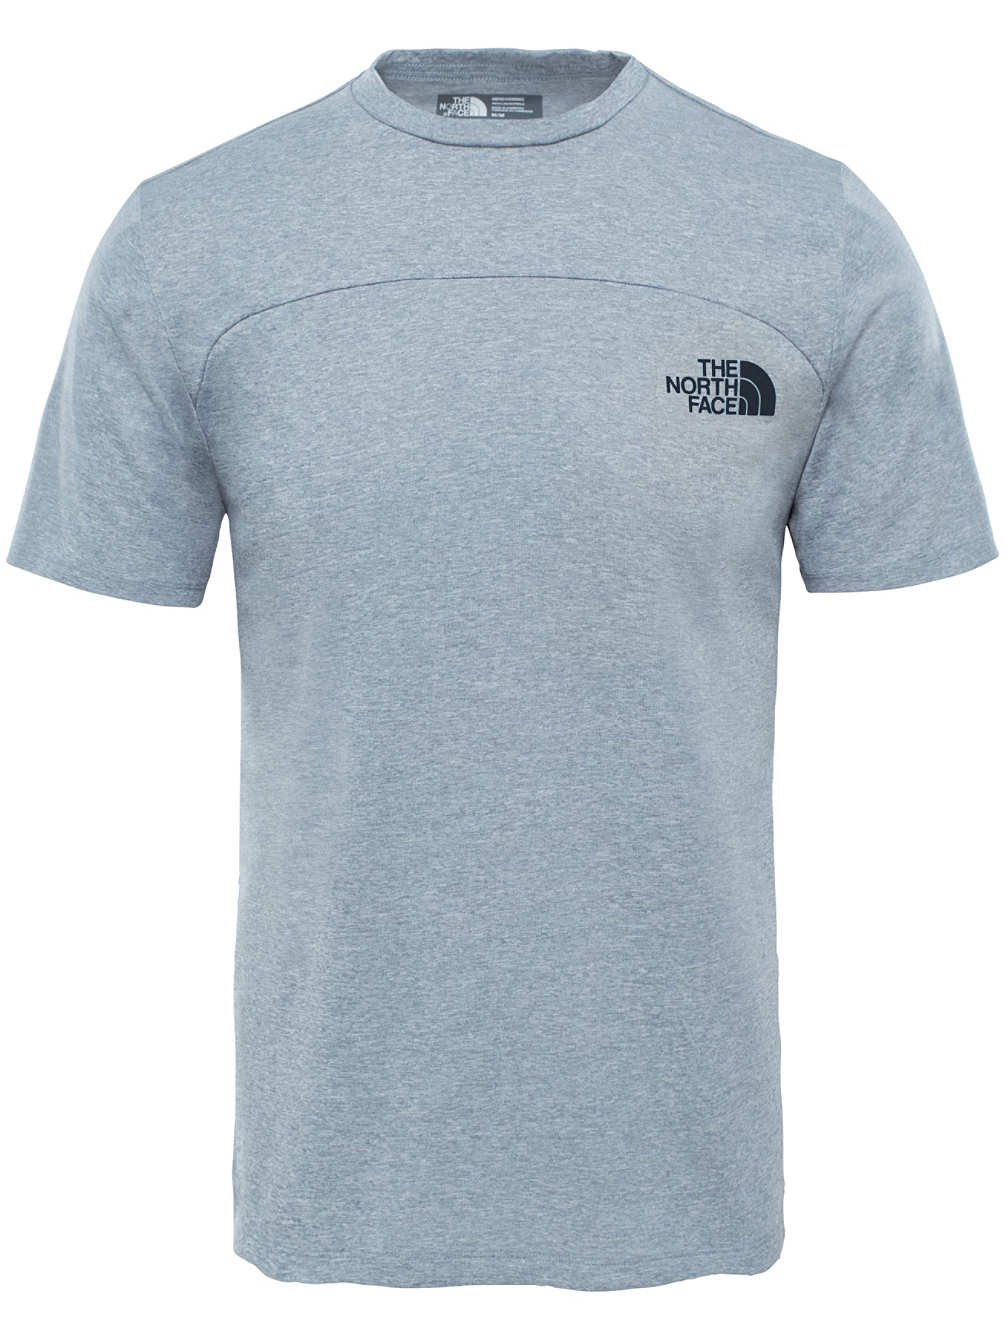 THE NORTH FACE Purna Stretch Short Sleeve Tee Shirt Men - Funktionsshirt